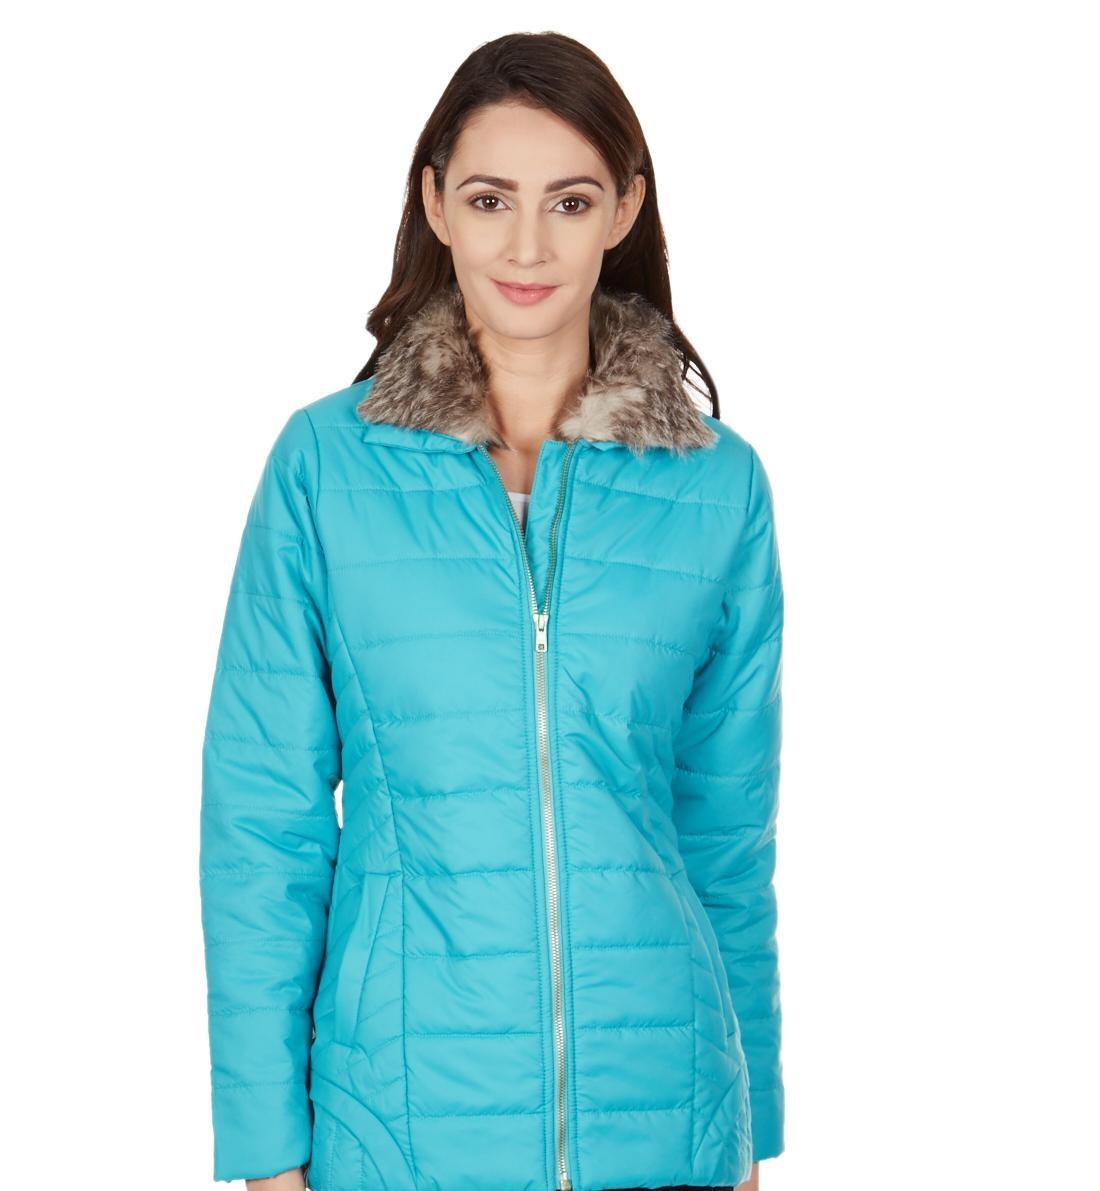 Monte Carlo ferozi parachute winter jacket for ladies